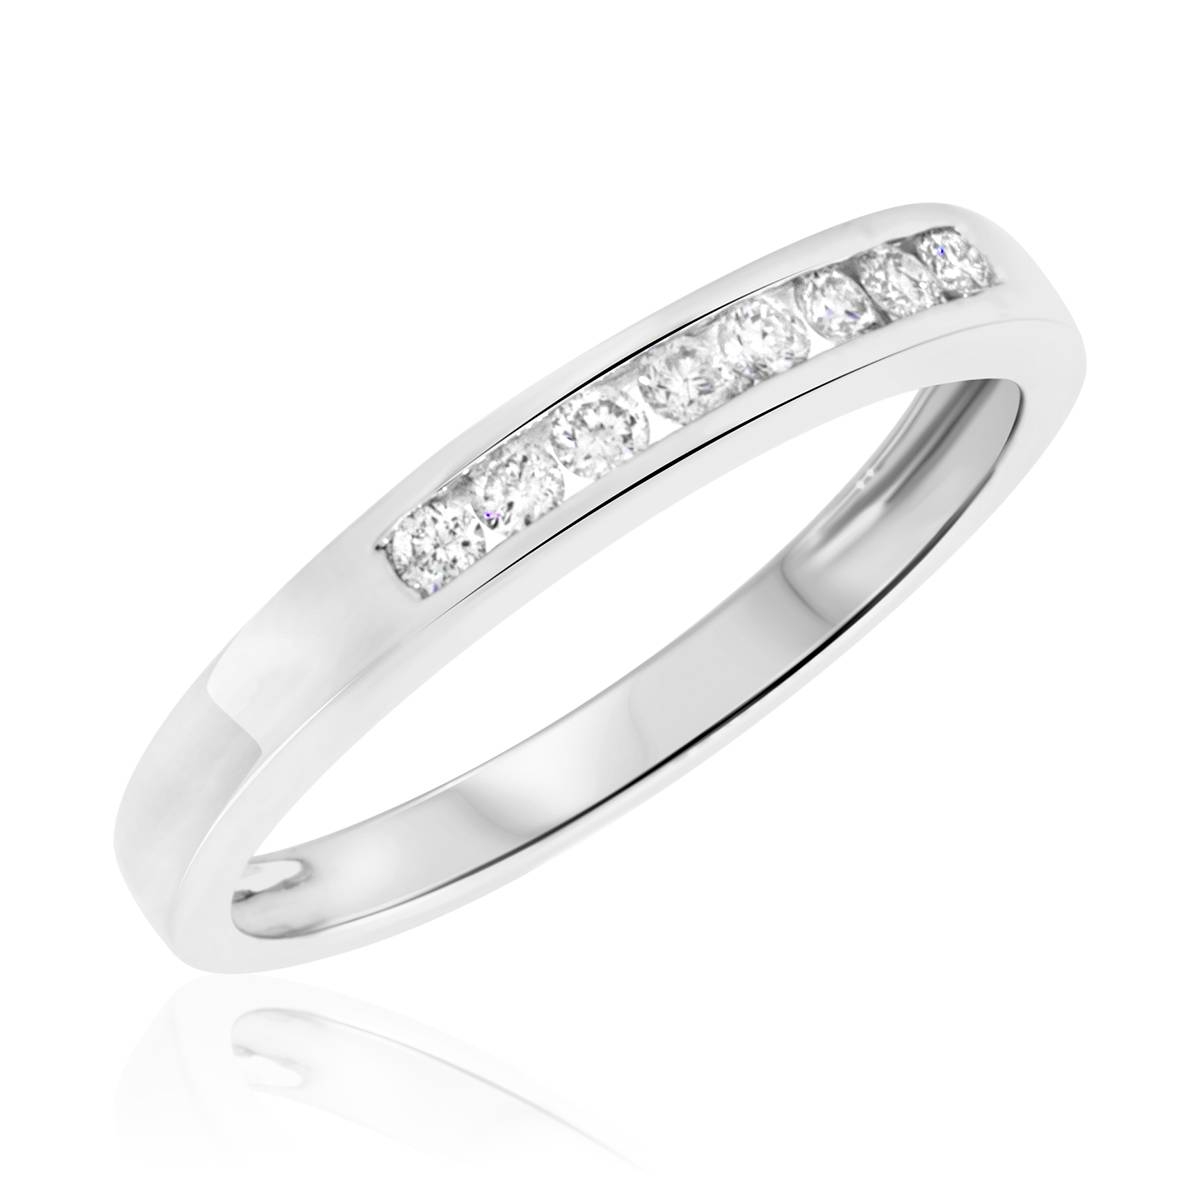 1/6 Ct. T.w. Diamond Women's Wedding Band 10K White Gold In White Gold Wedding Bands For Women (Gallery 1 of 15)